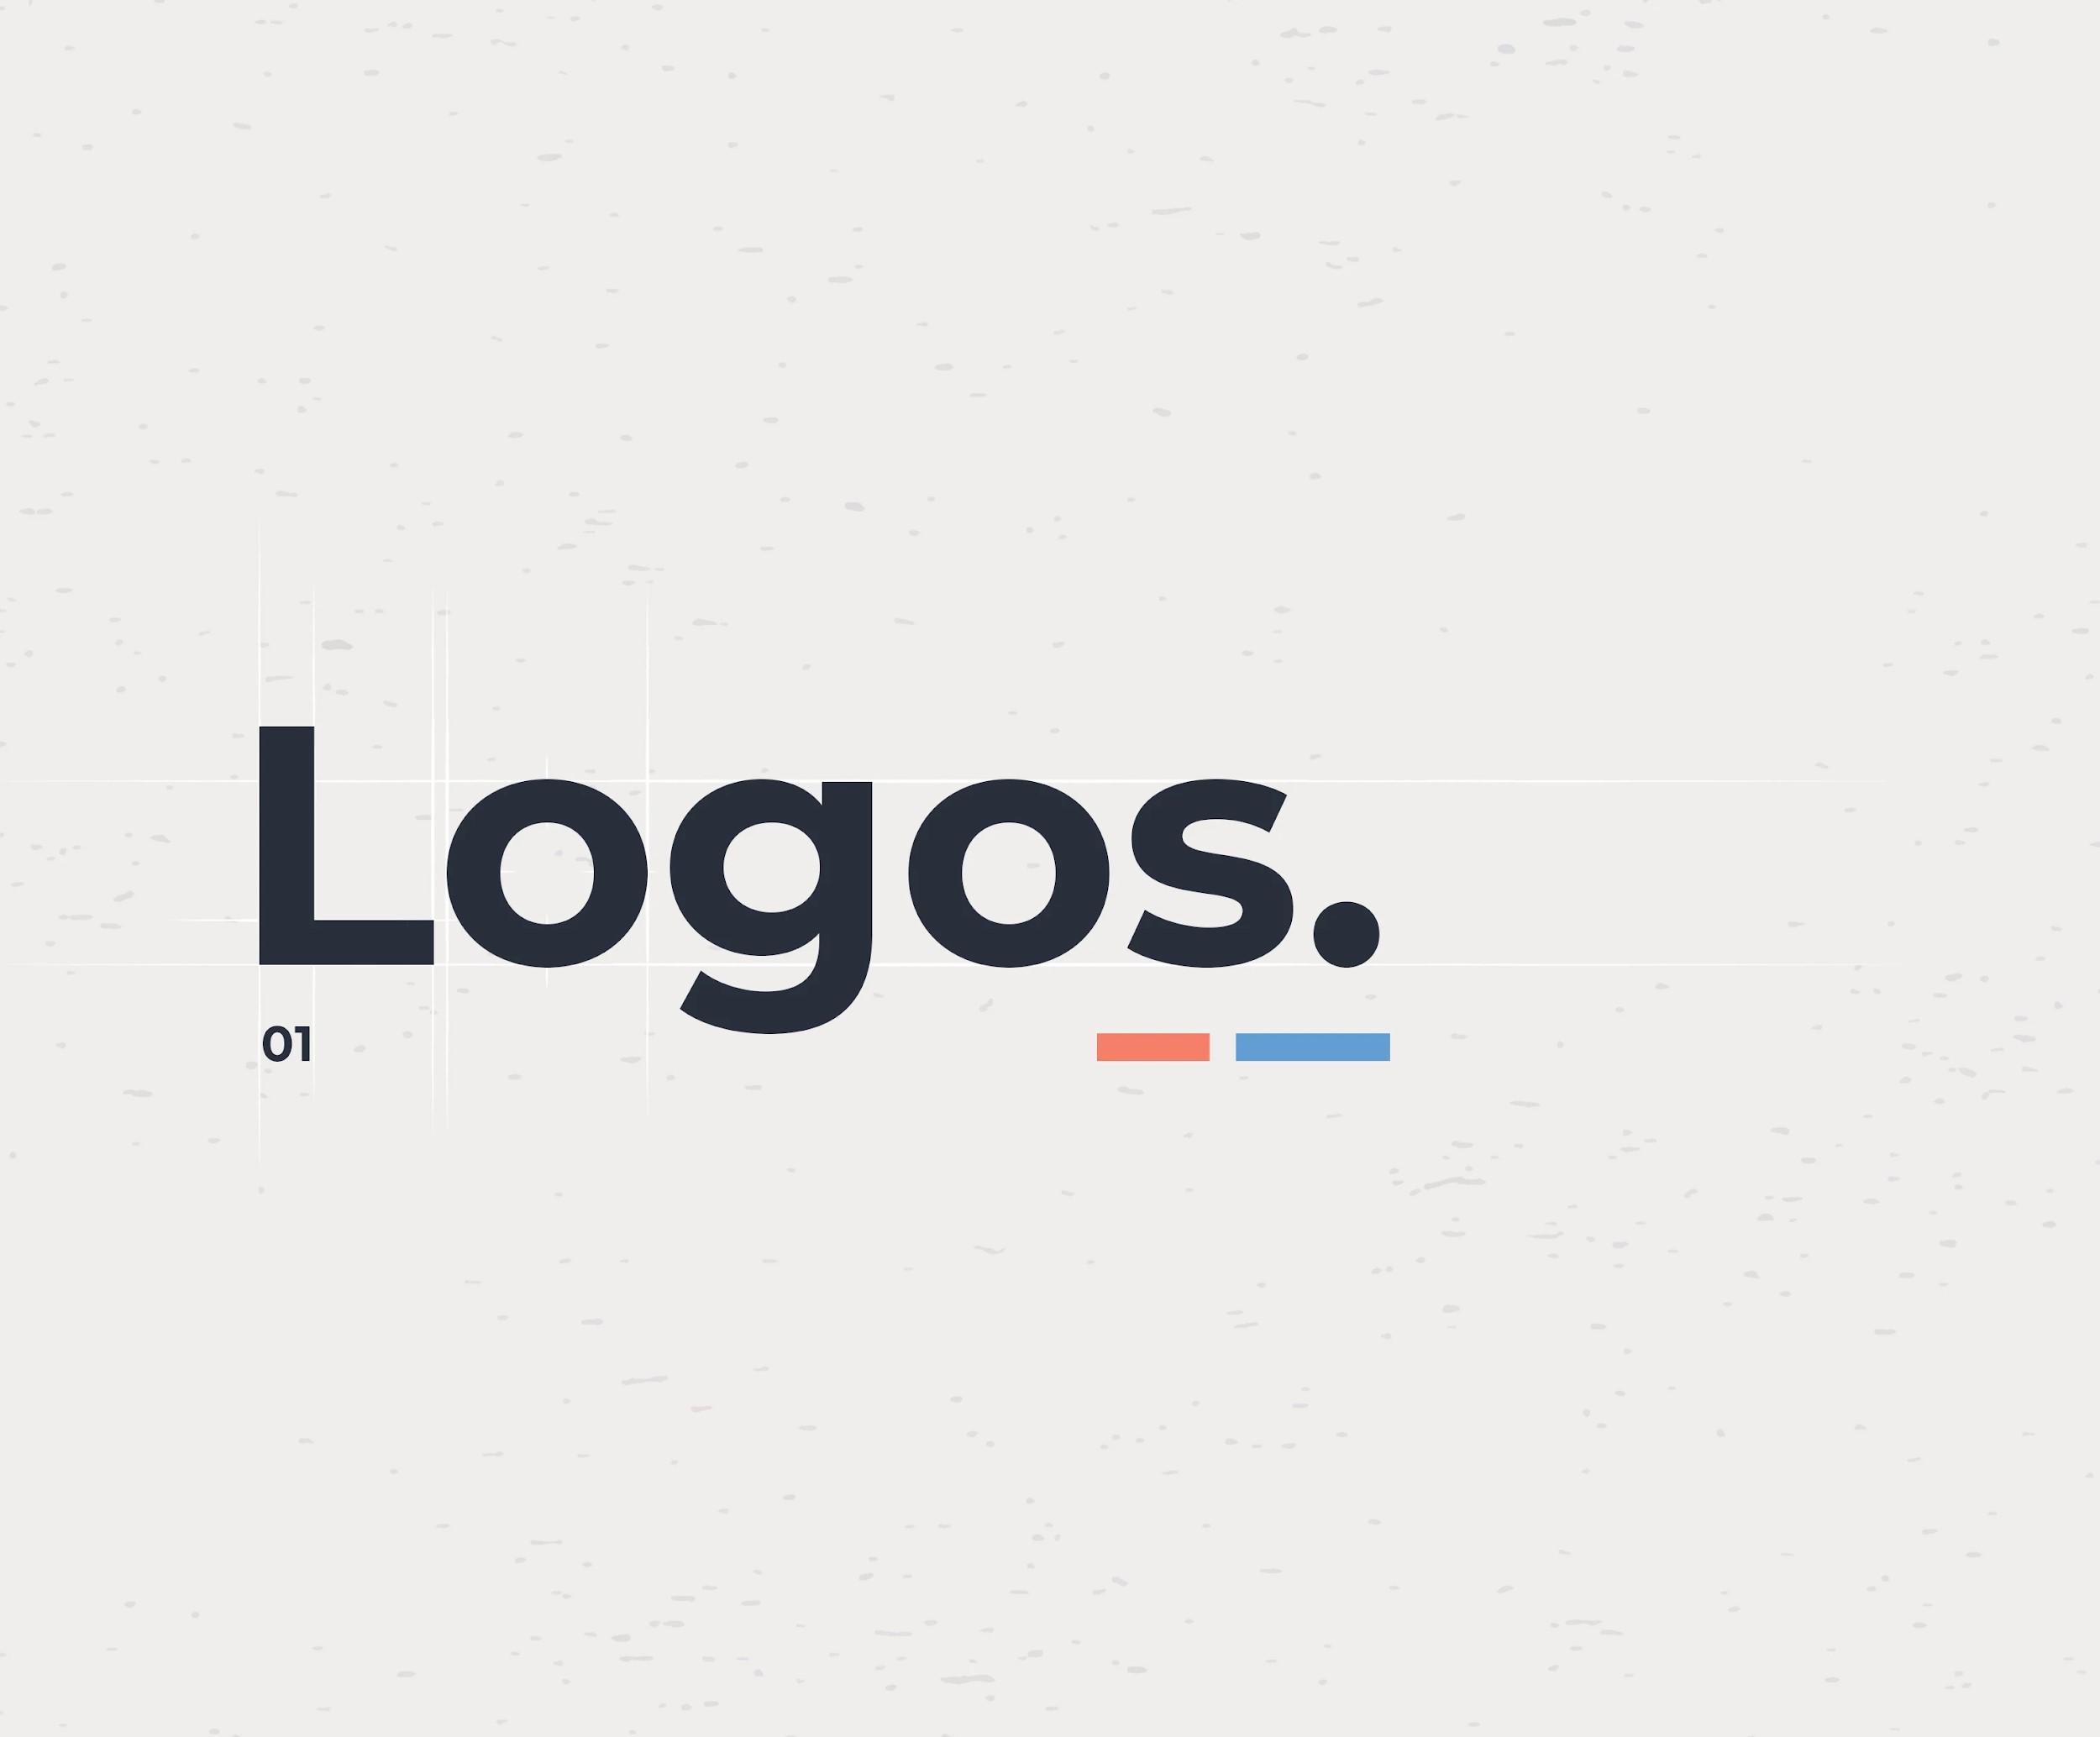 Indigo logo design - Best logo design company in the USA